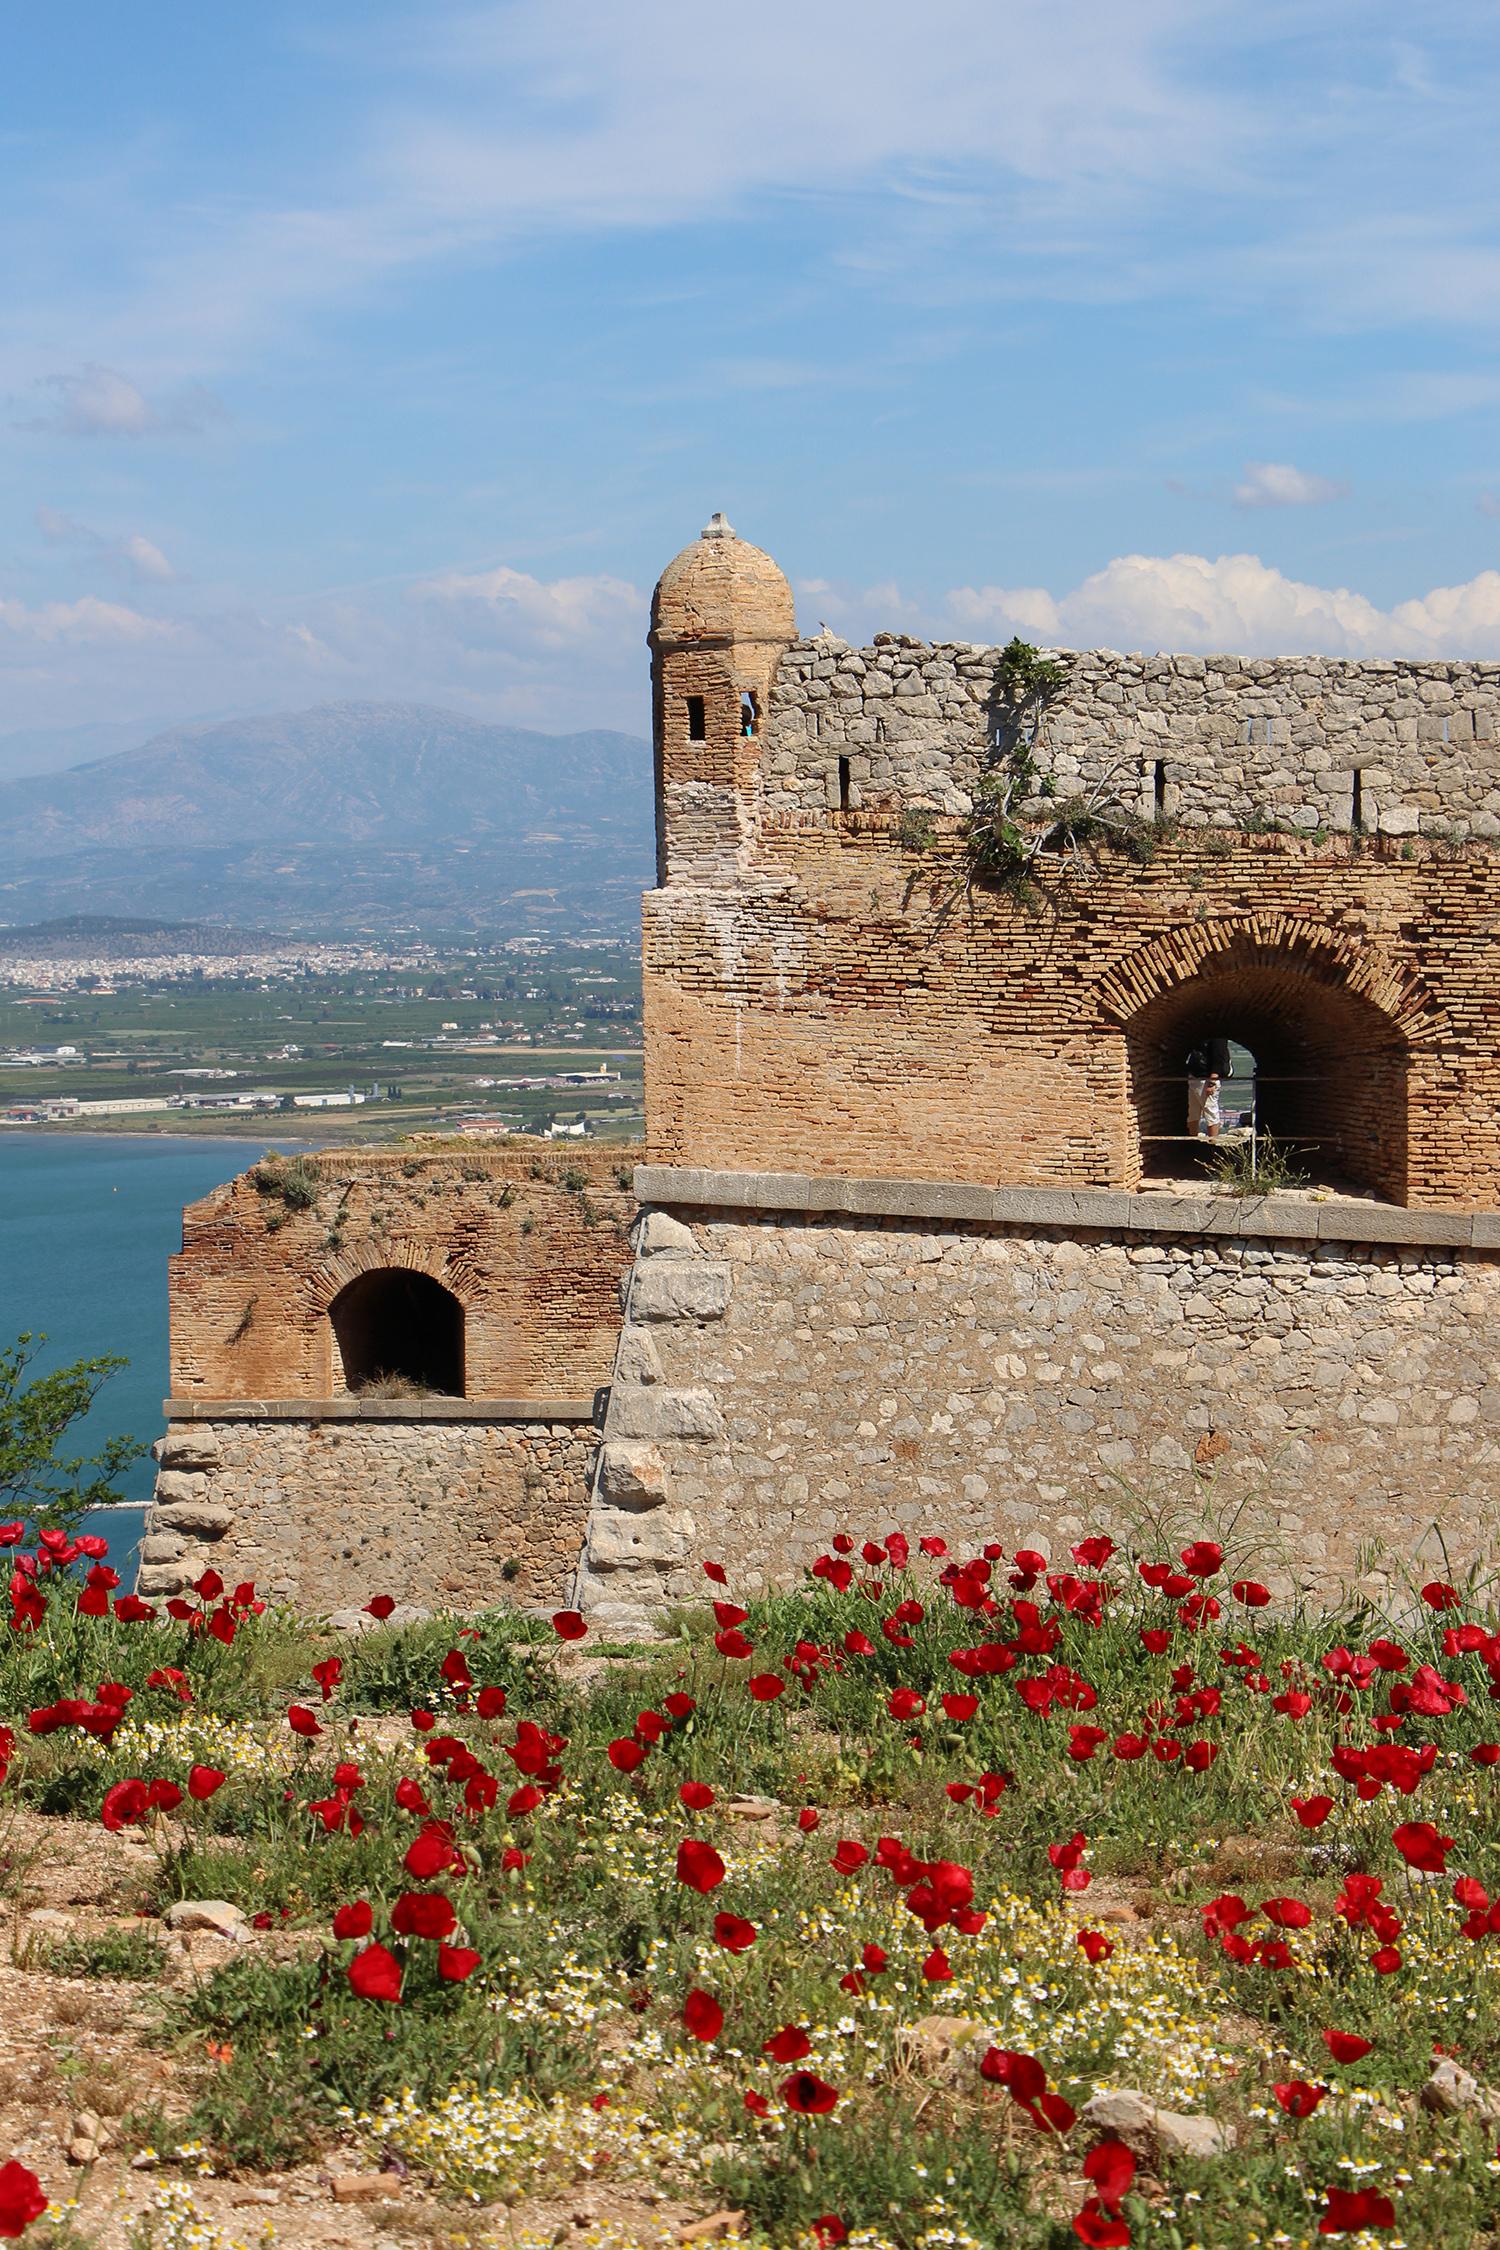 nafplio palamidi fortress bastions